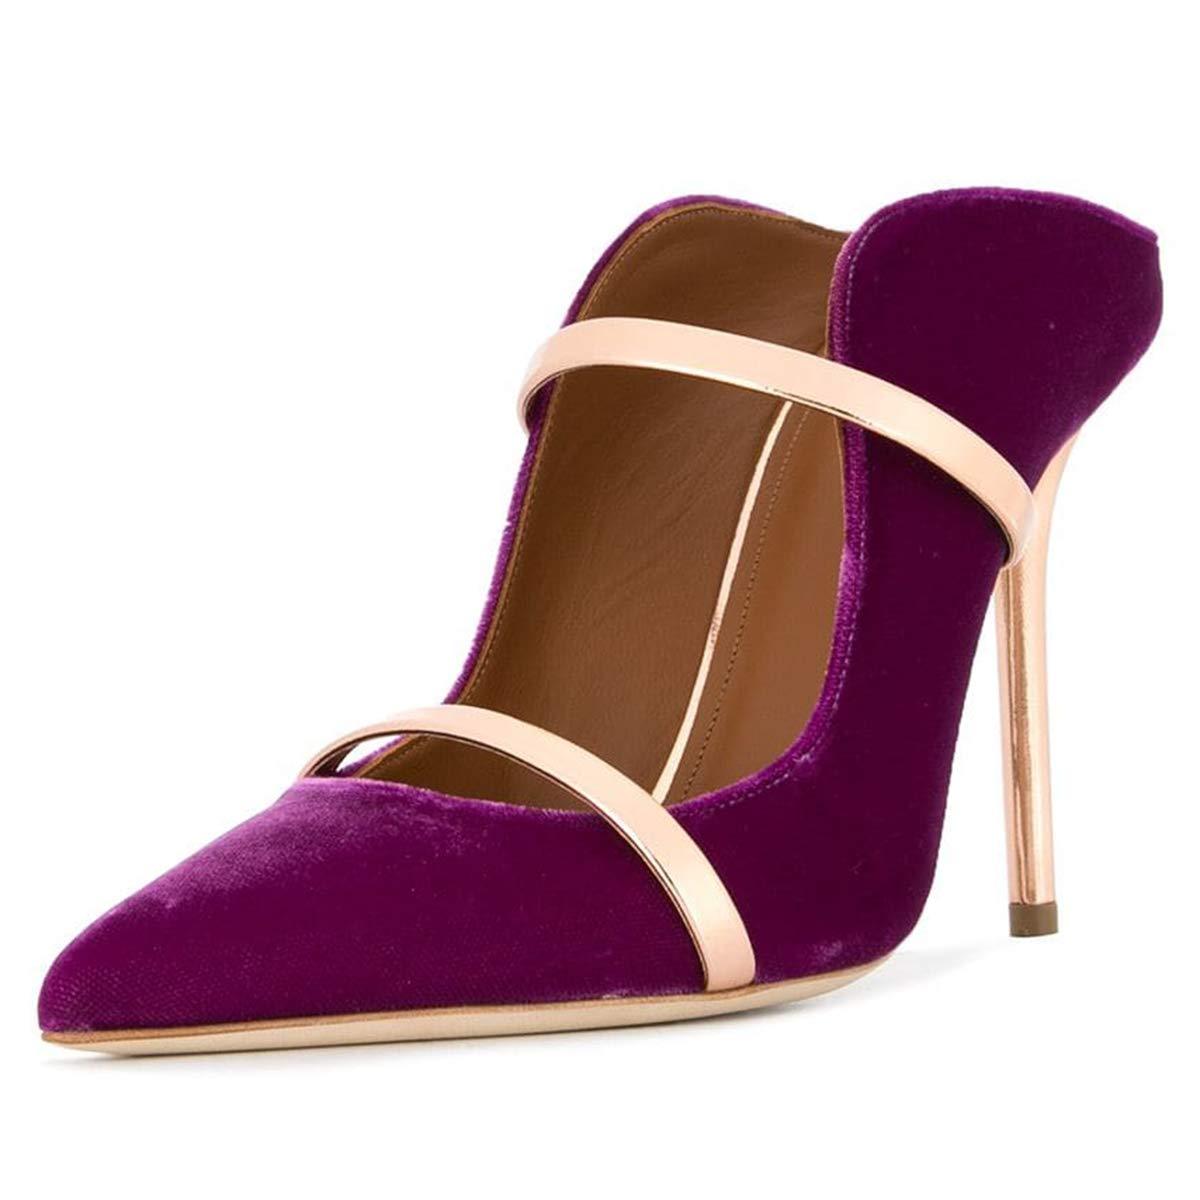 bddcb24057 FSJ Women Fashion Pointy Toe Pumps High Heels Mule Sandals Double Straps  Slide Shoes Size 7 Purple-12 cm